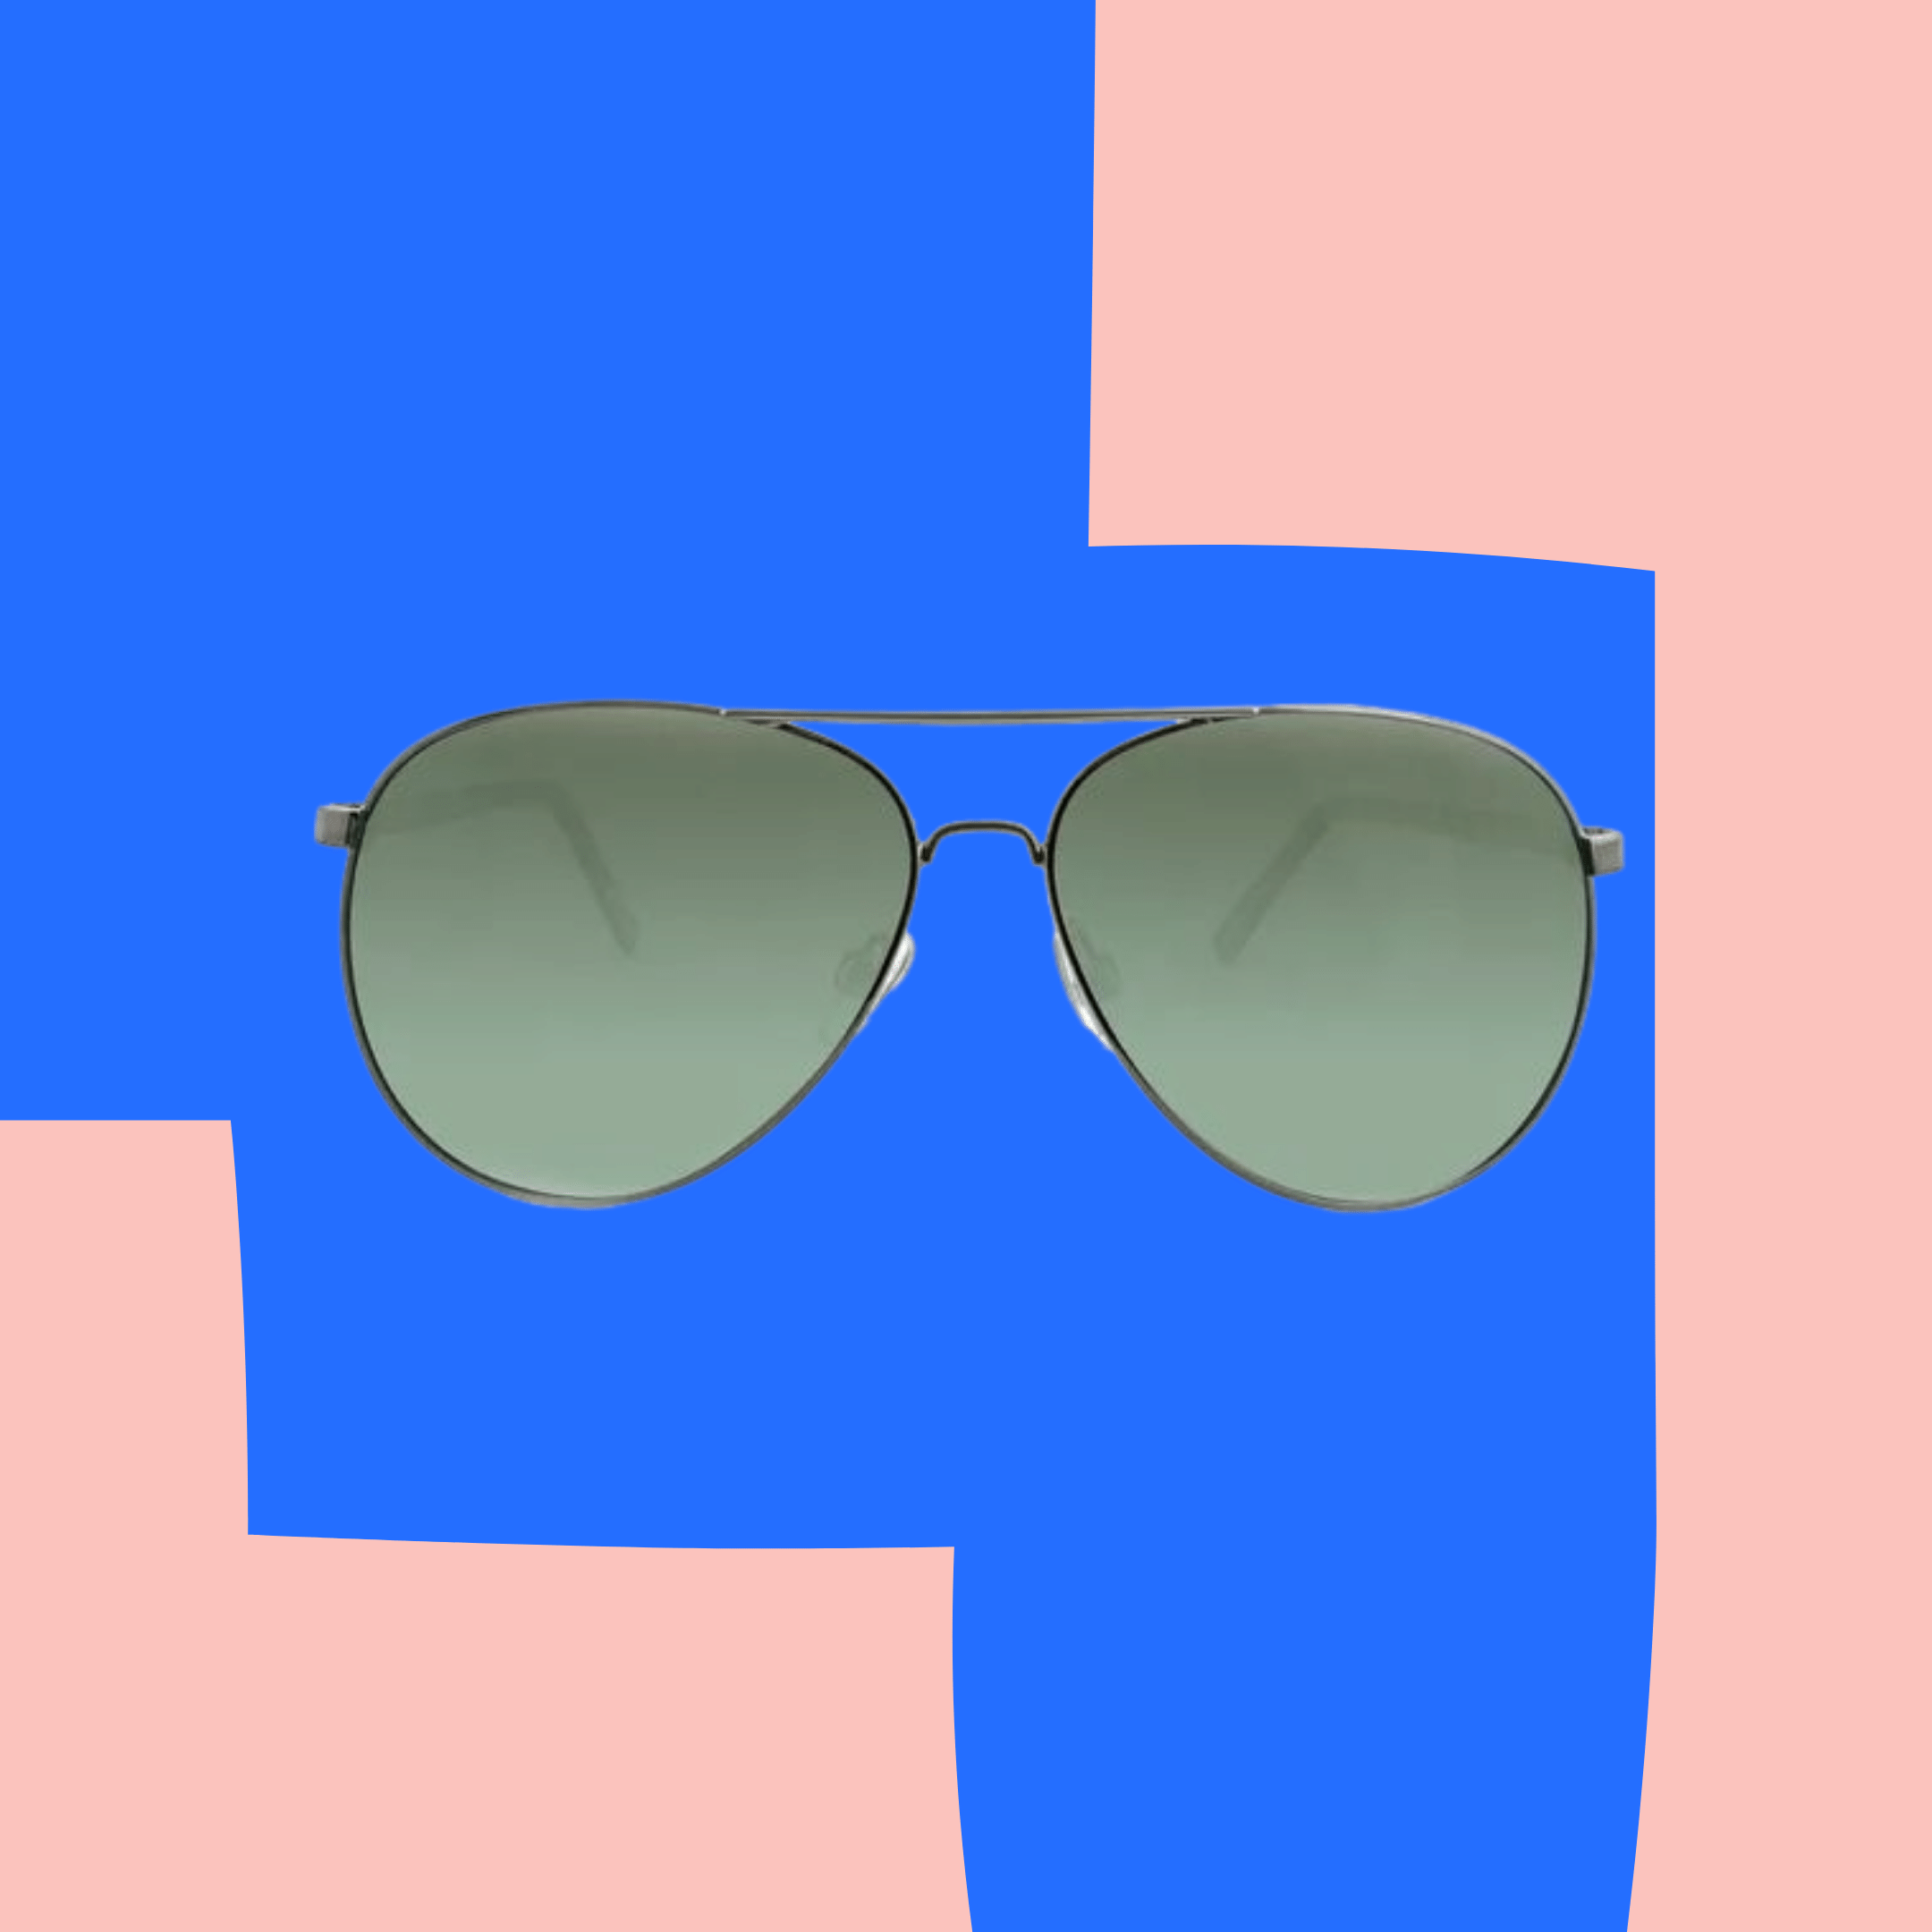 target goodfellow aviator sunglasses